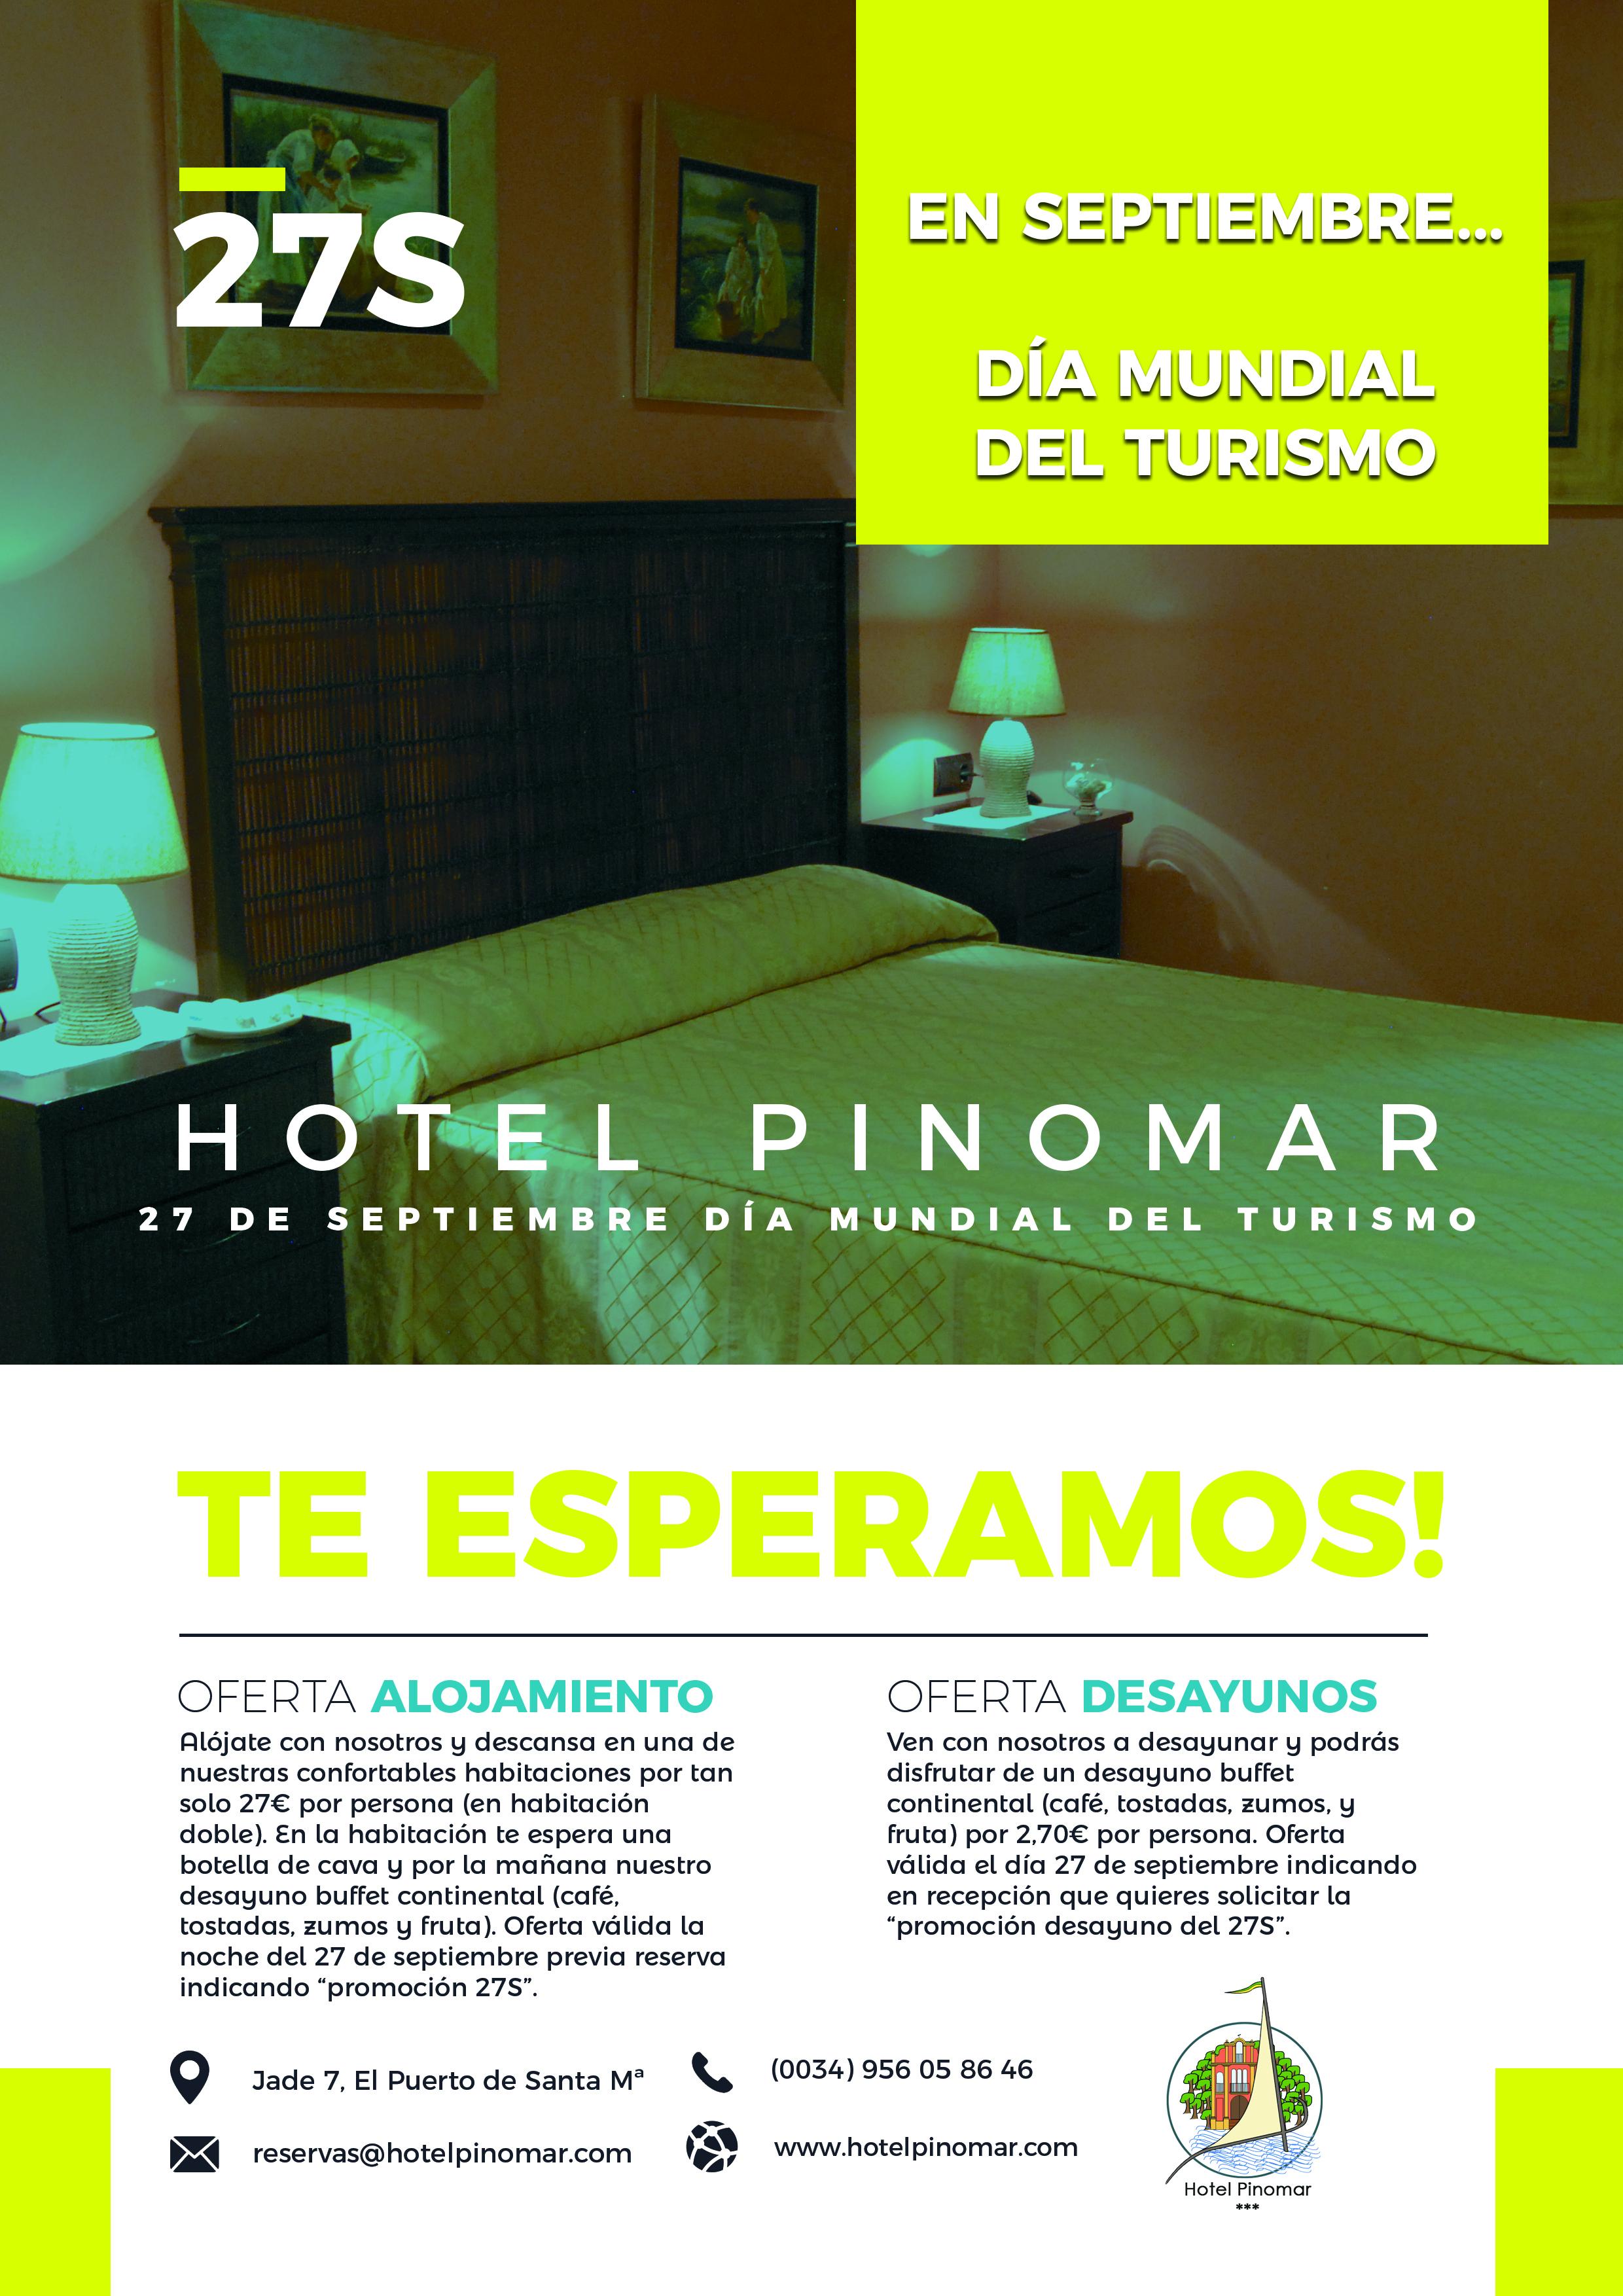 oferta 27s 2017 Pinomar